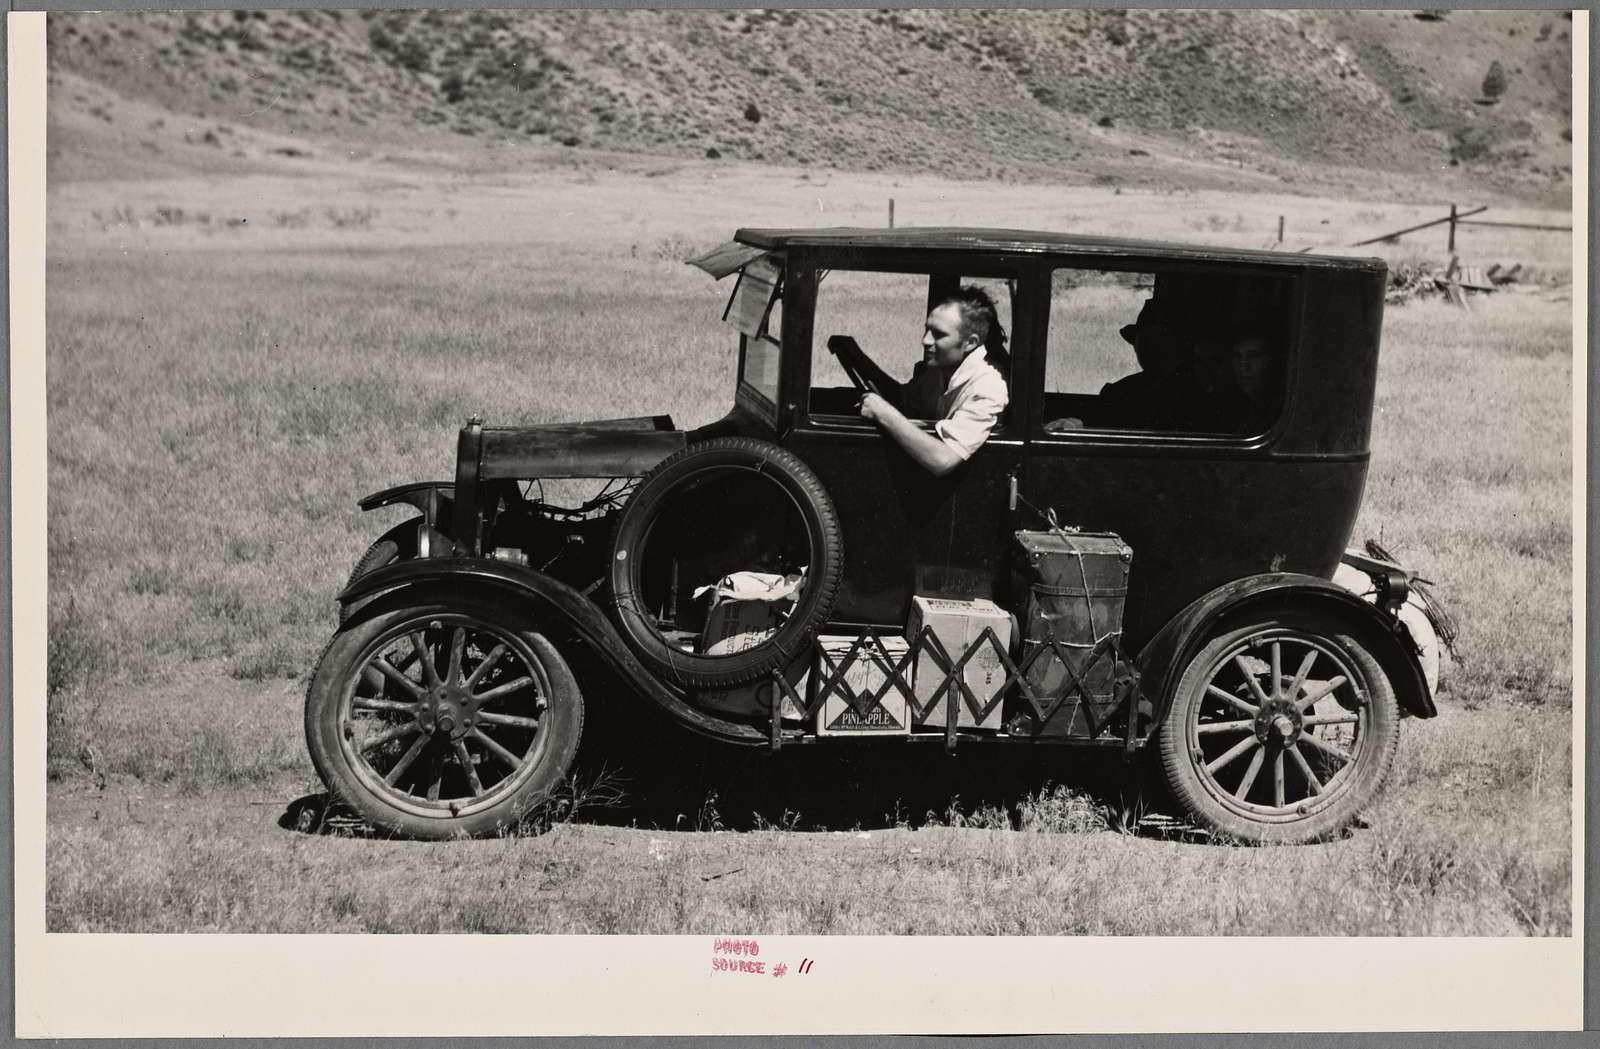 Vernon Evans leaving South Dakota for a new start in the Pacific Northwest. Near Missoula, Montana.